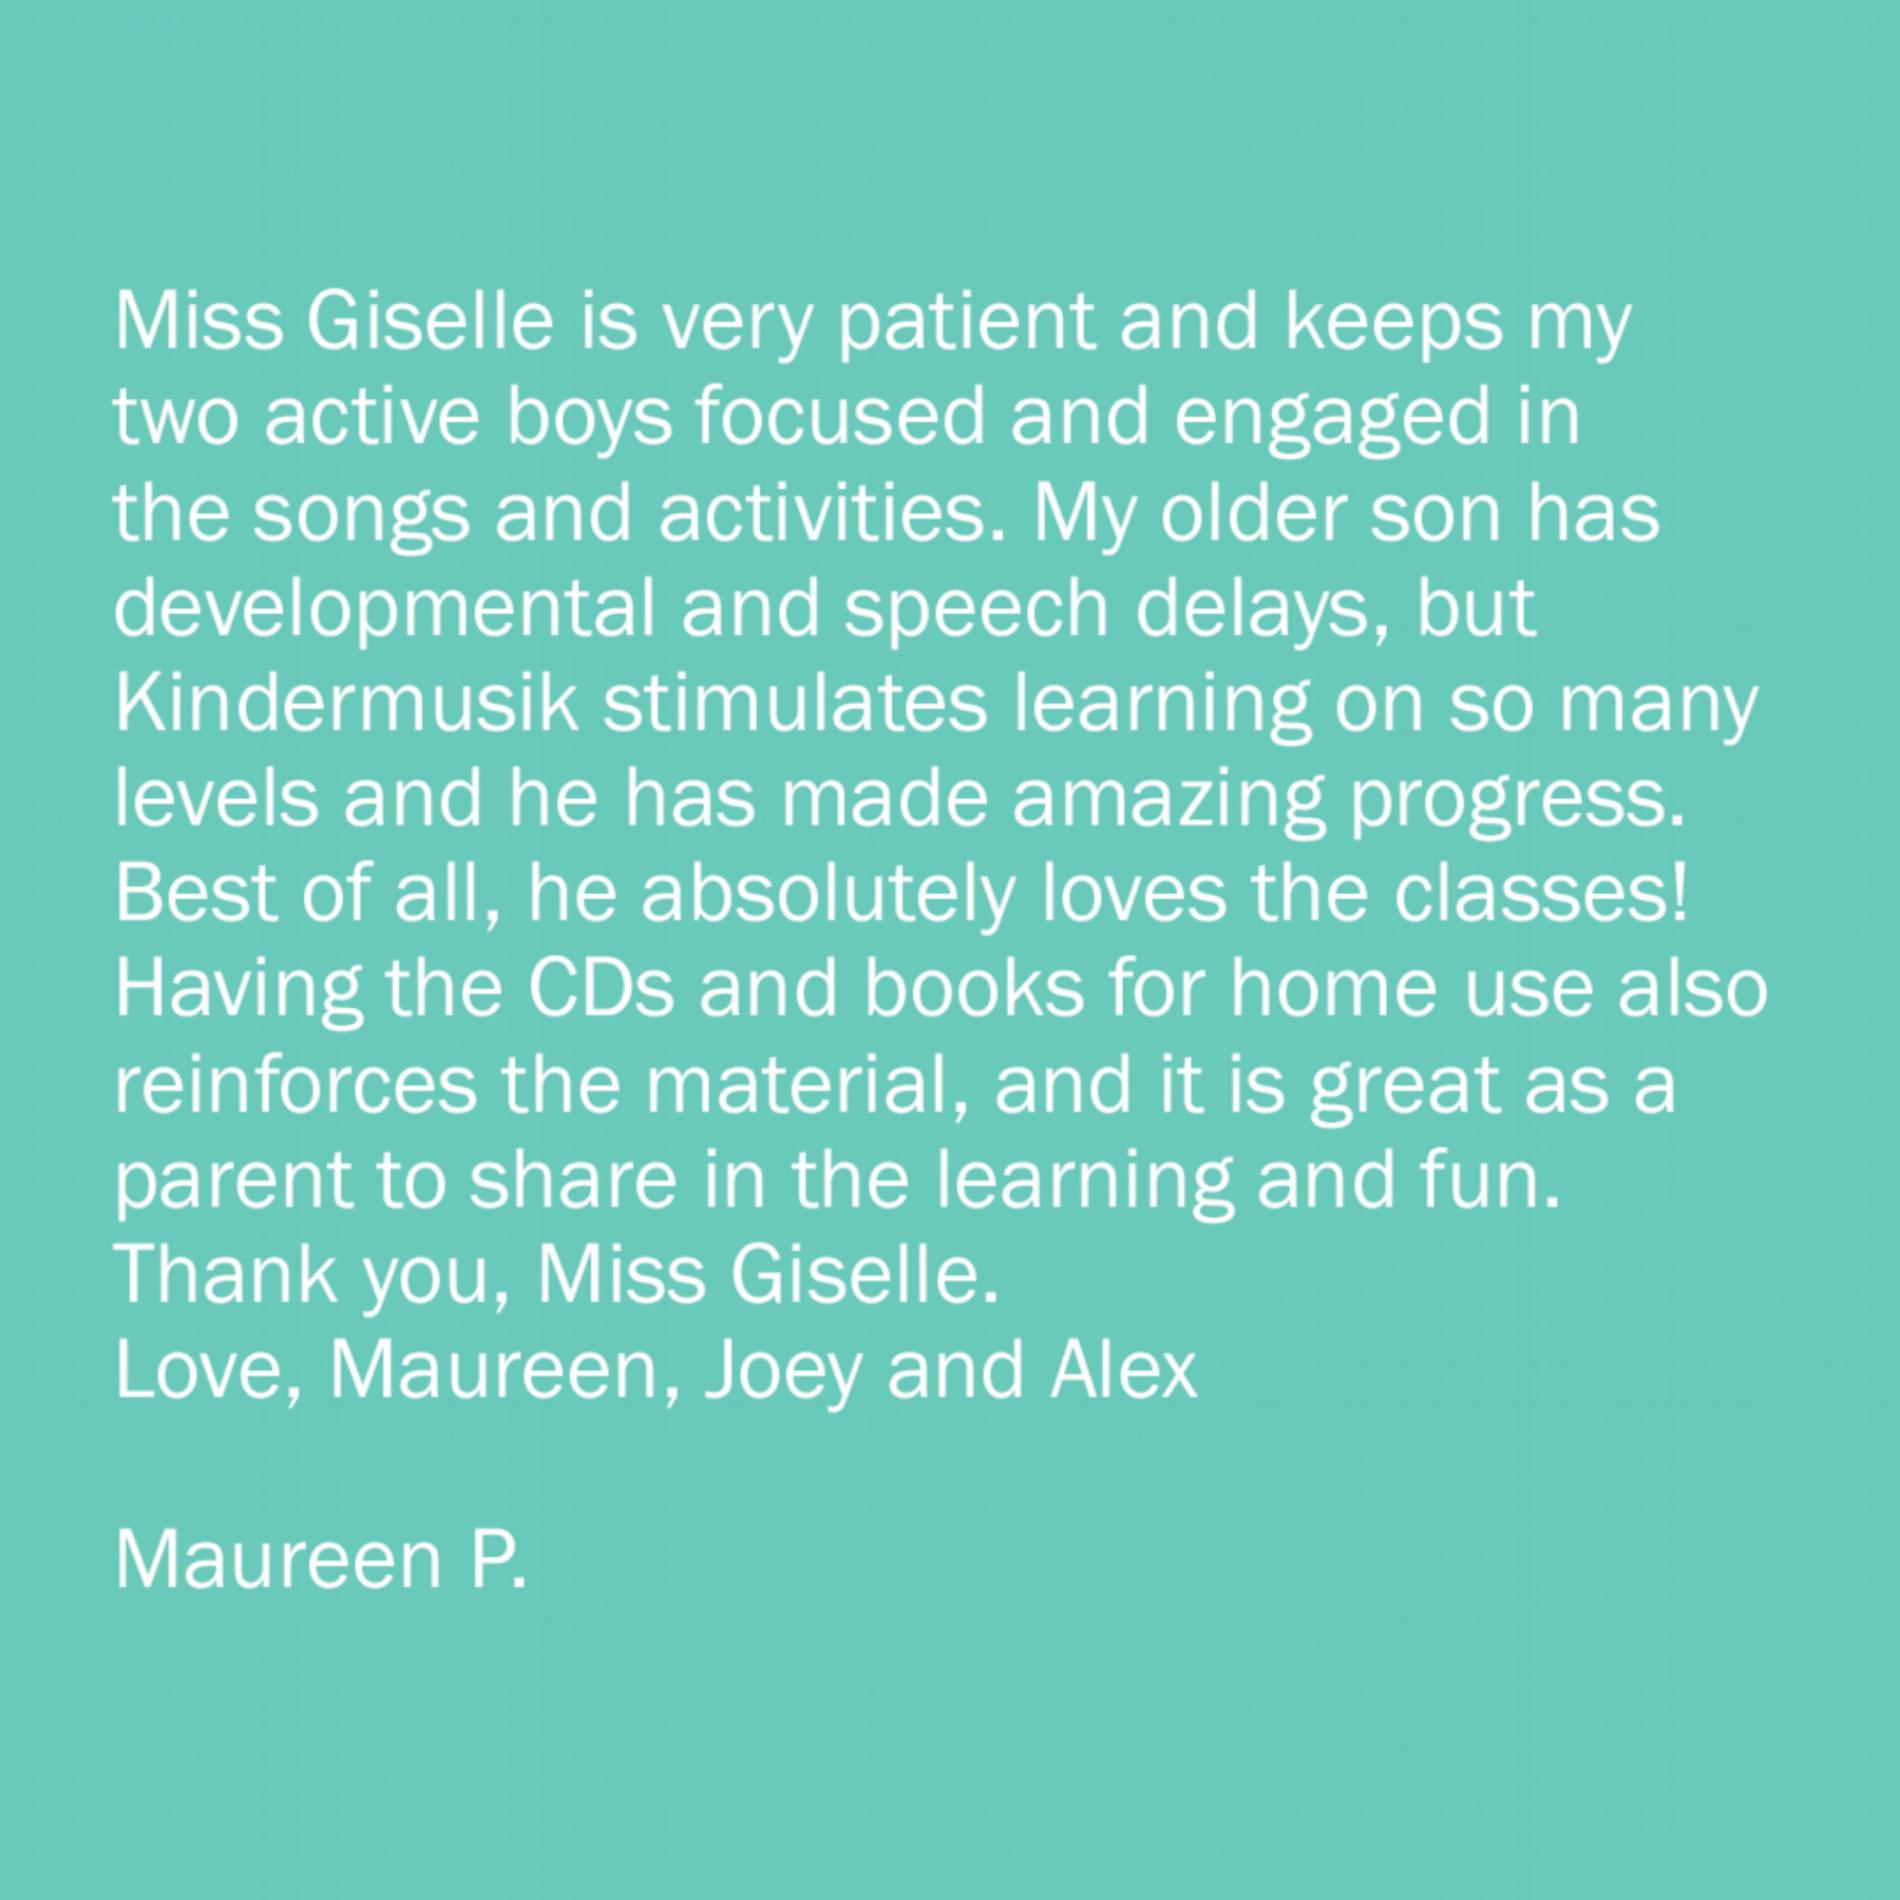 parentcomments_maureen-P..png